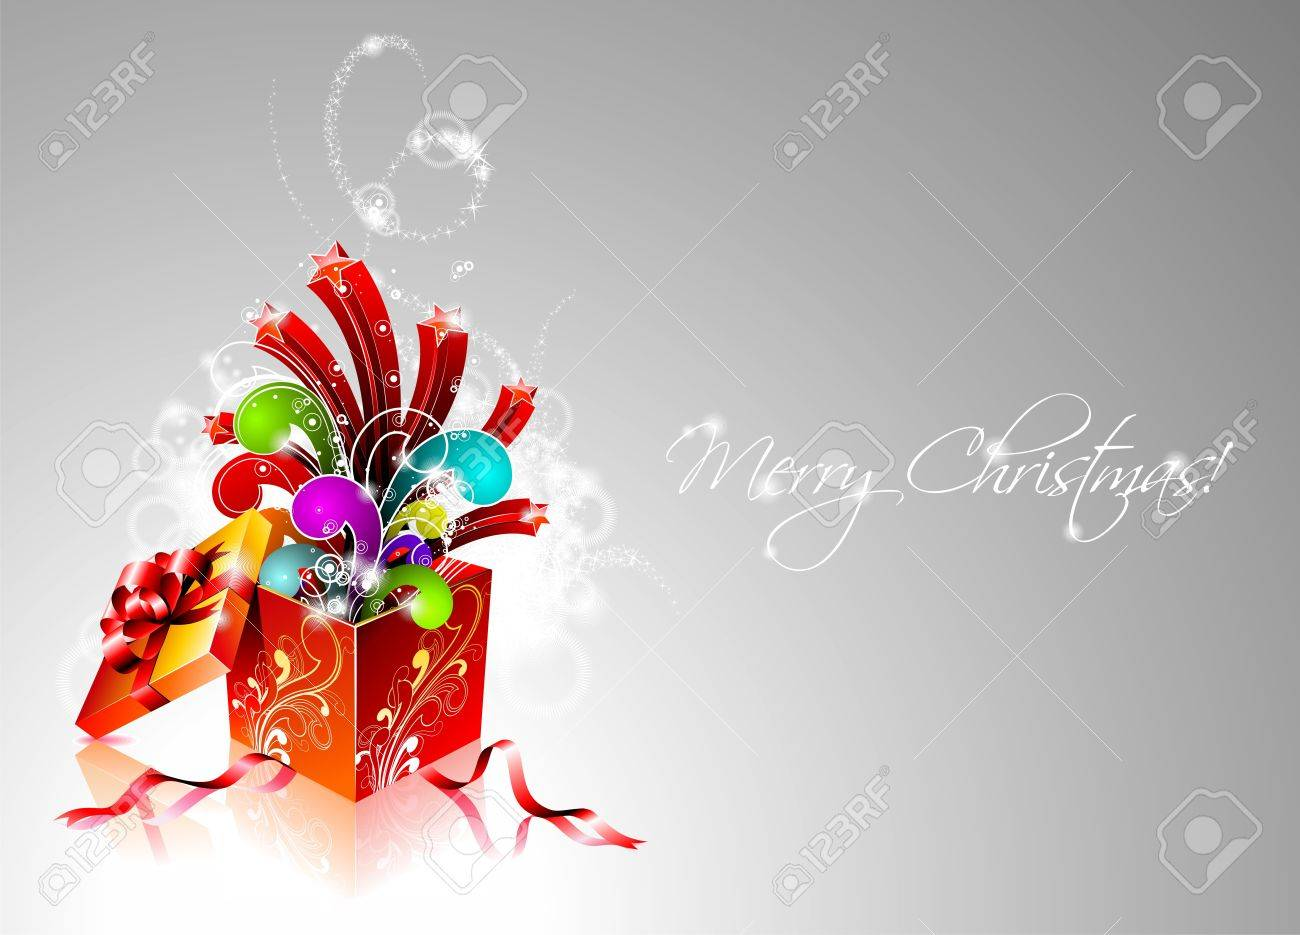 Christmas illustration with magic gift box Stock Vector - 15098161